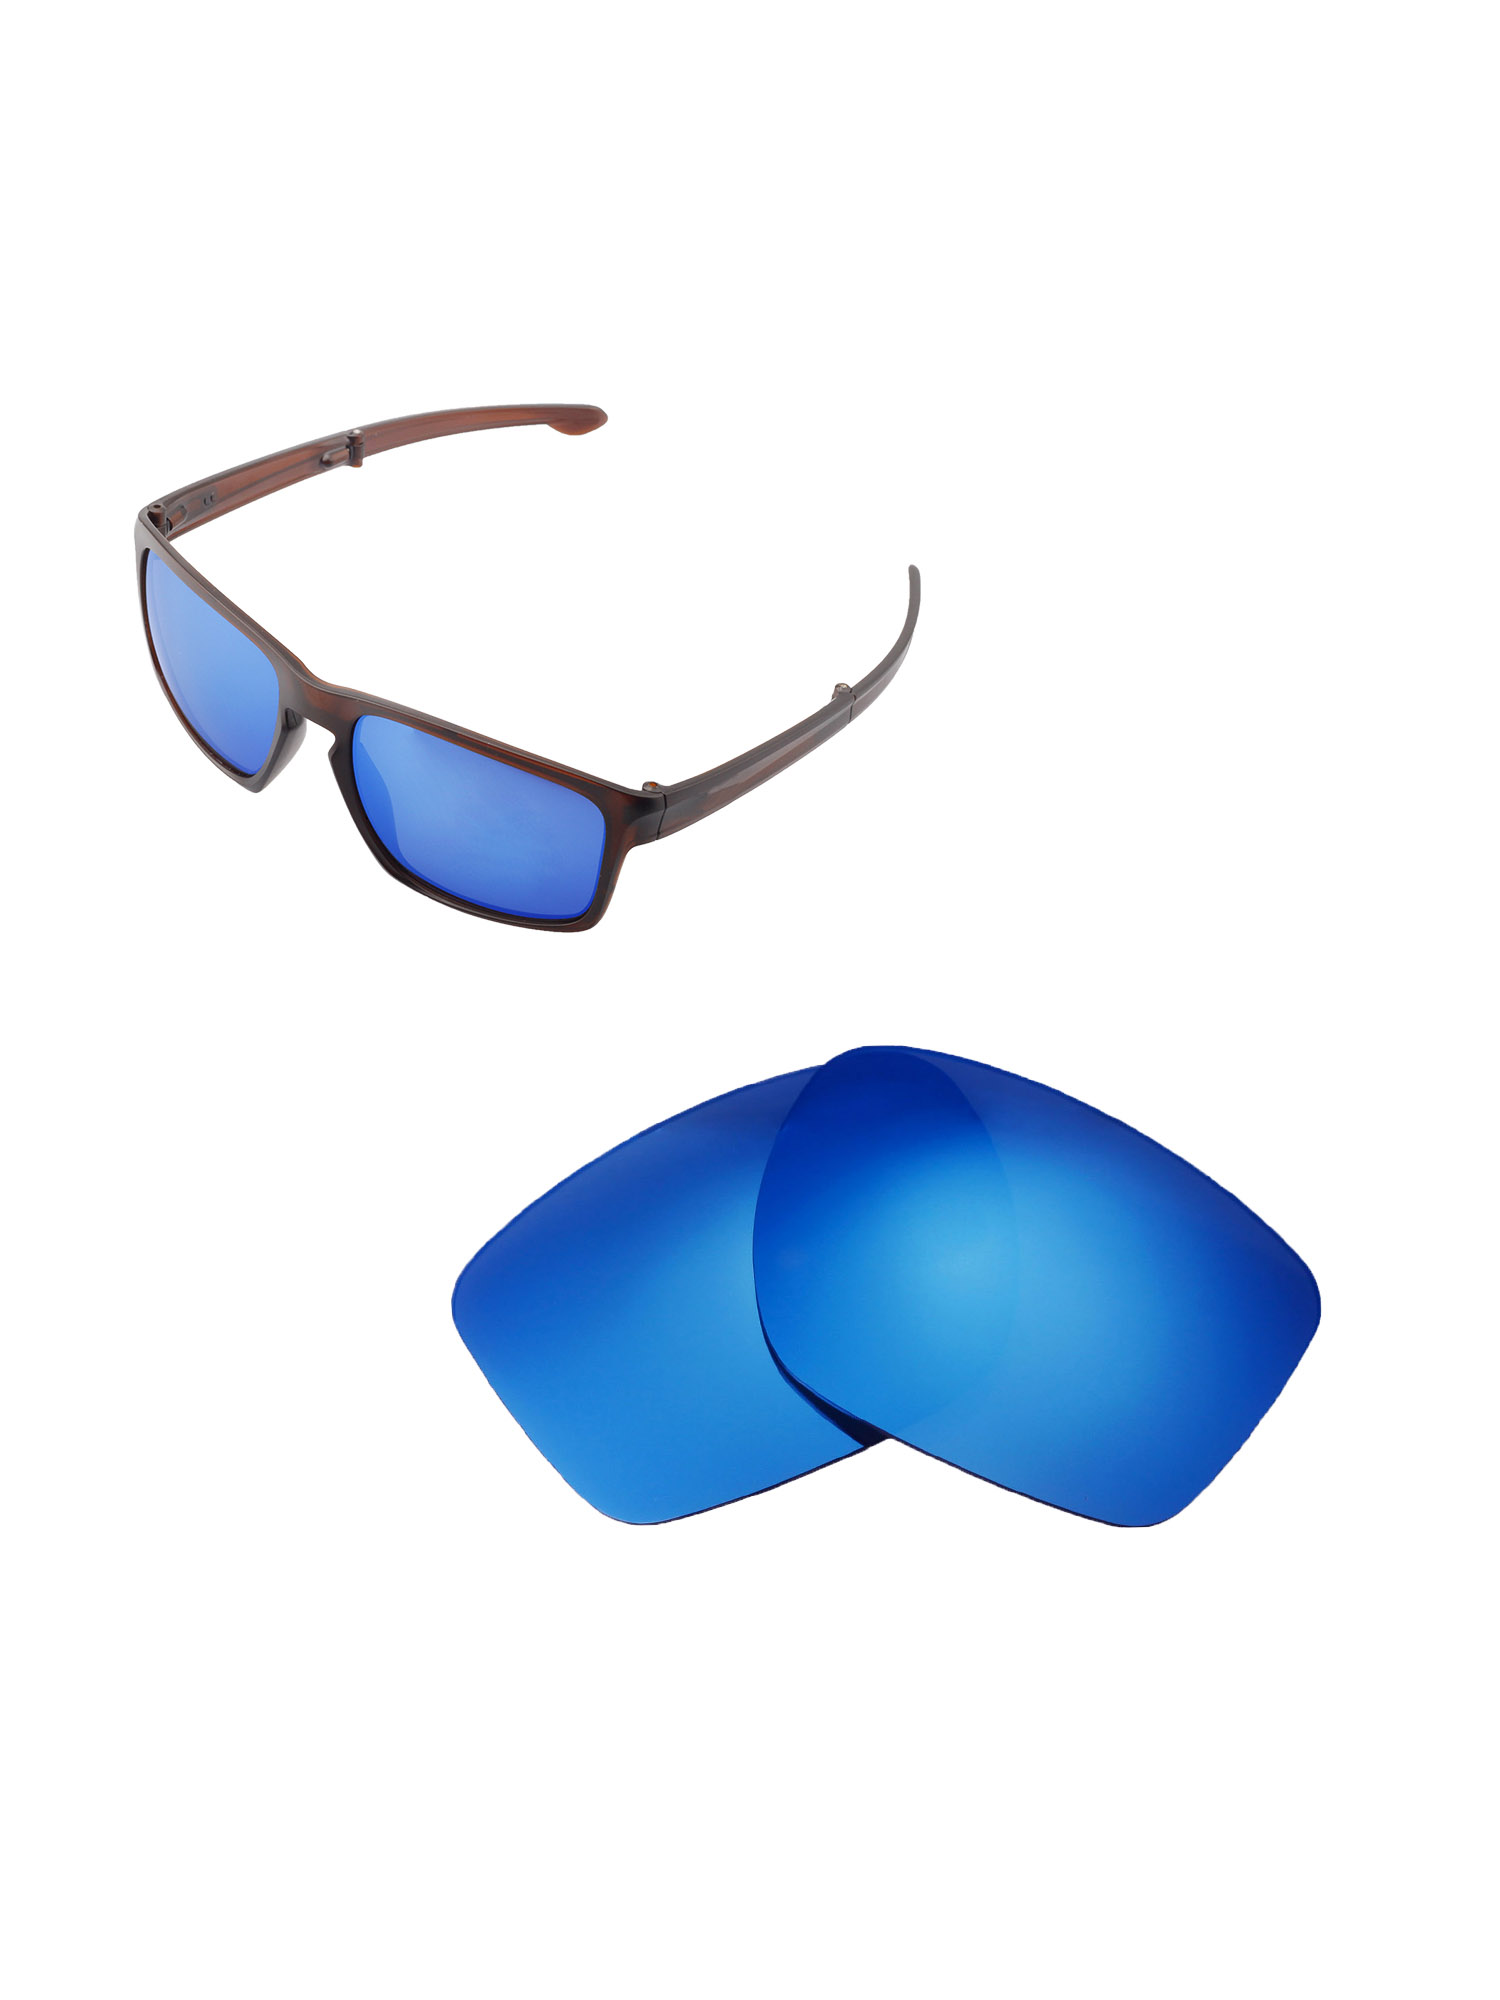 0ccd6ace1e8 Walleva - Walleva Titanium Polarized Replacement Lenses for Oakley Sliver F  Sunglasses - Walmart.com